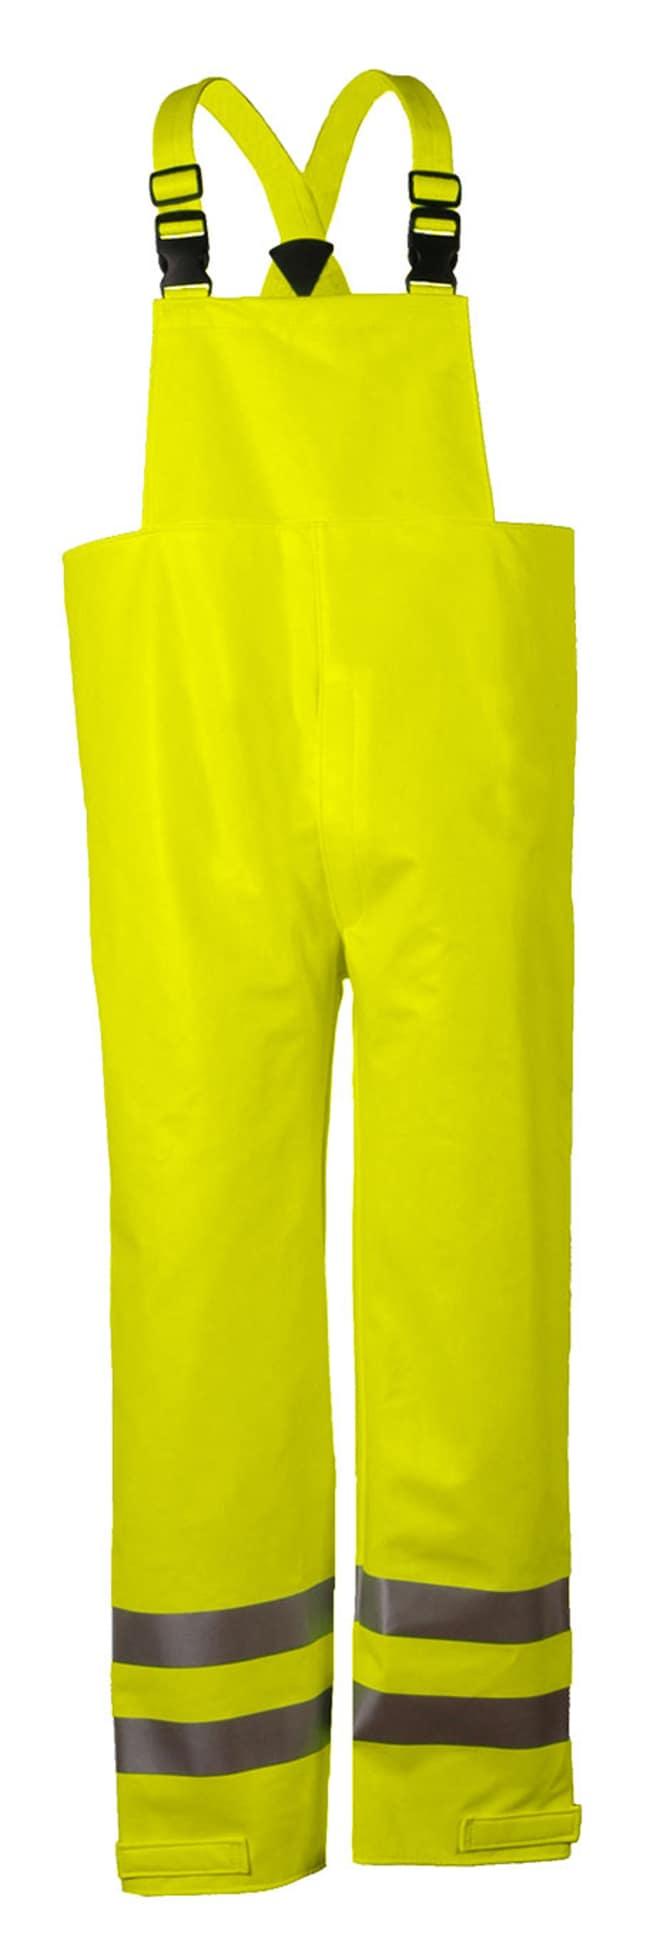 National Safety ApparelArc H2O FR Hi-Vis Yellow Bib Overall - Class E:Personal